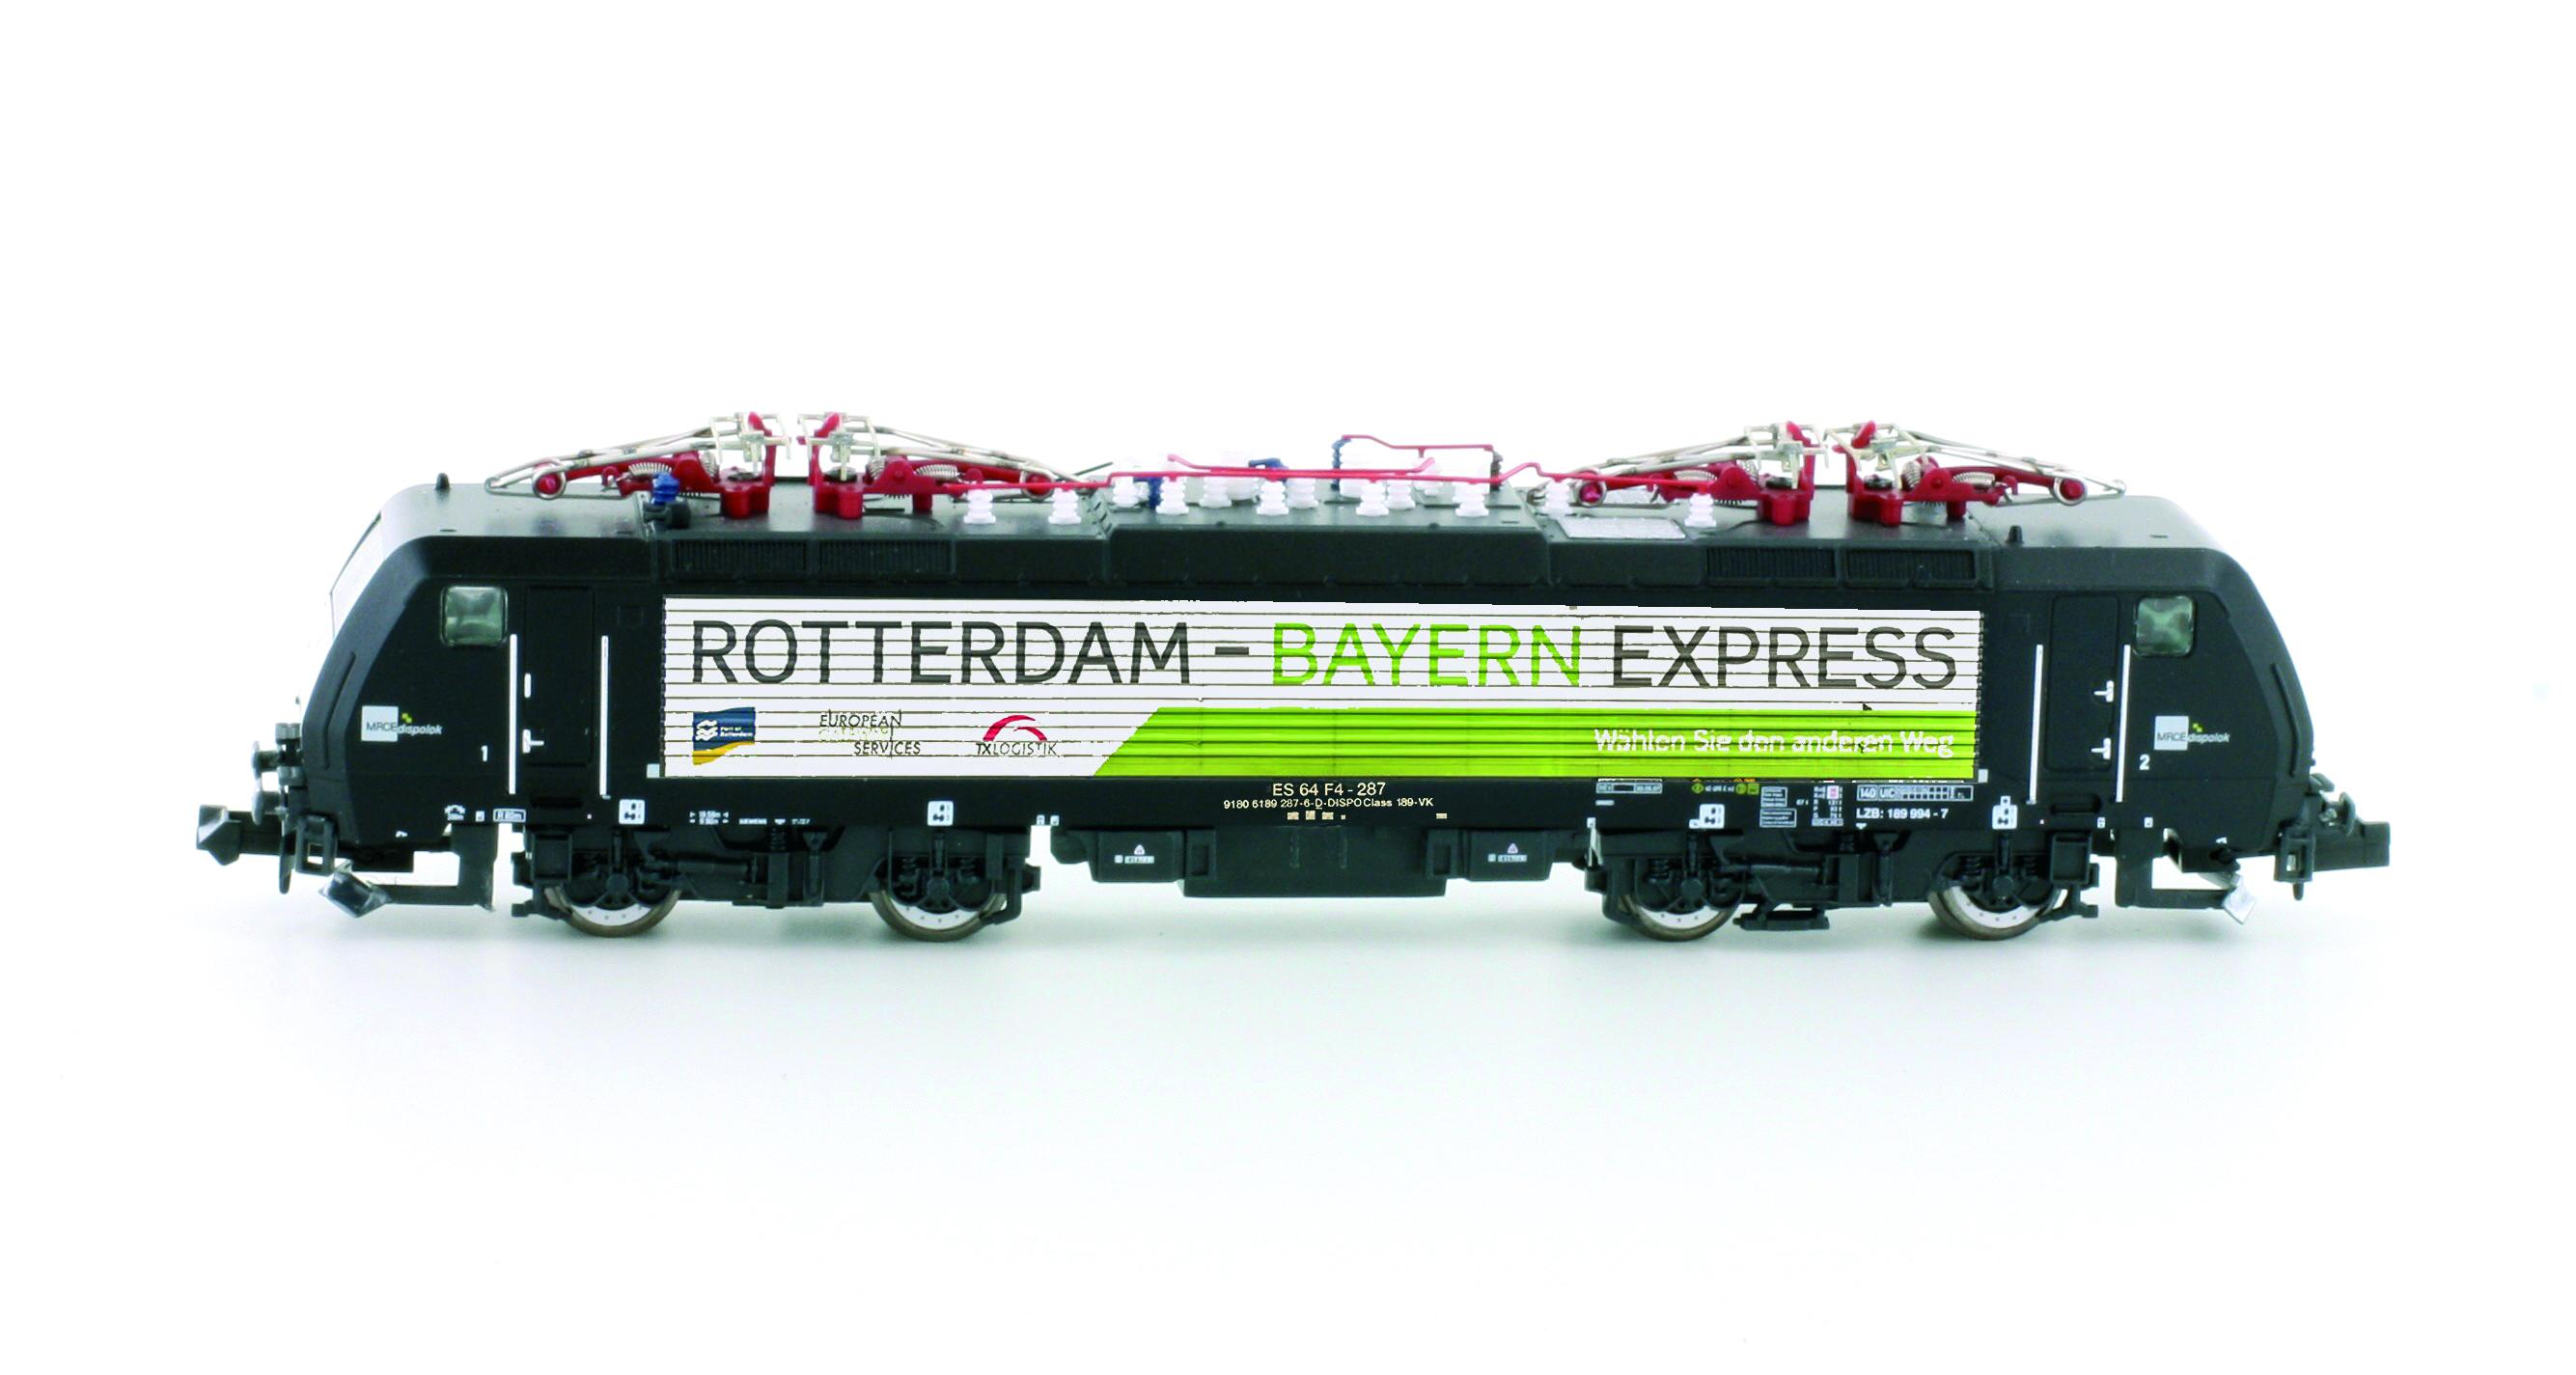 Hobbytrain 2924-1 S Spur N E-Lok BR189 MRCE R.-B.-Express SOUND